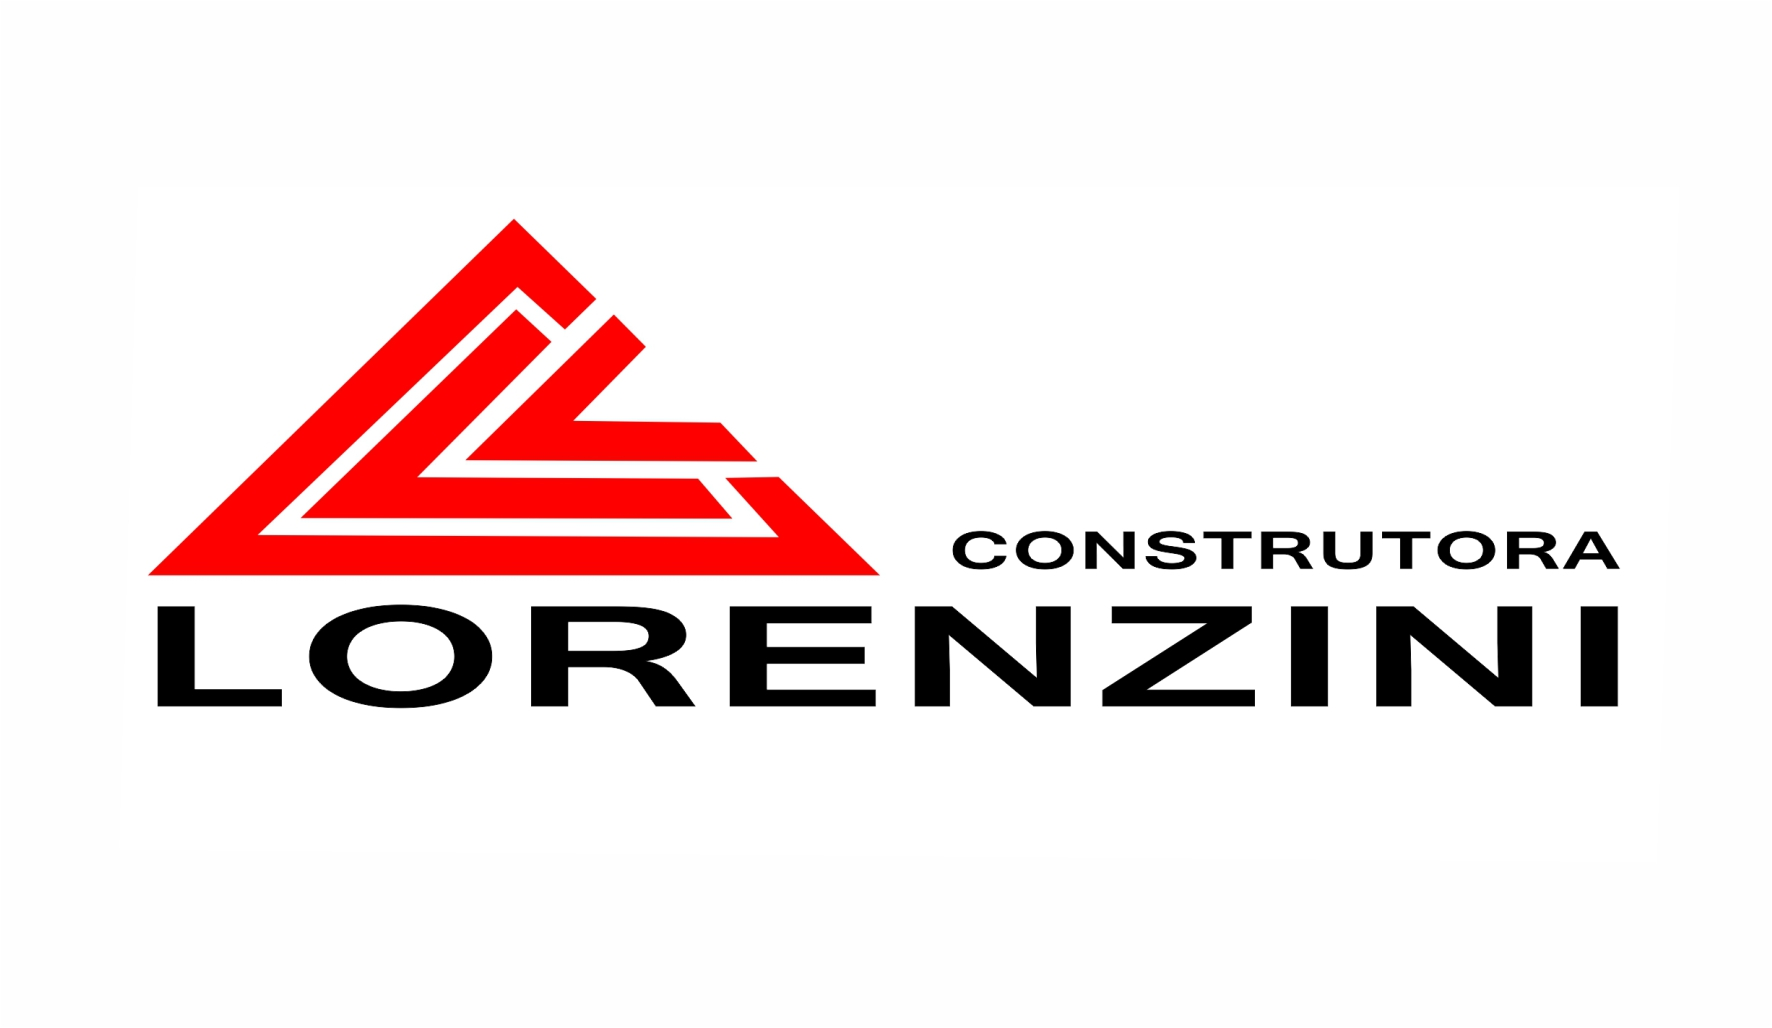 Construtora Lorenzini